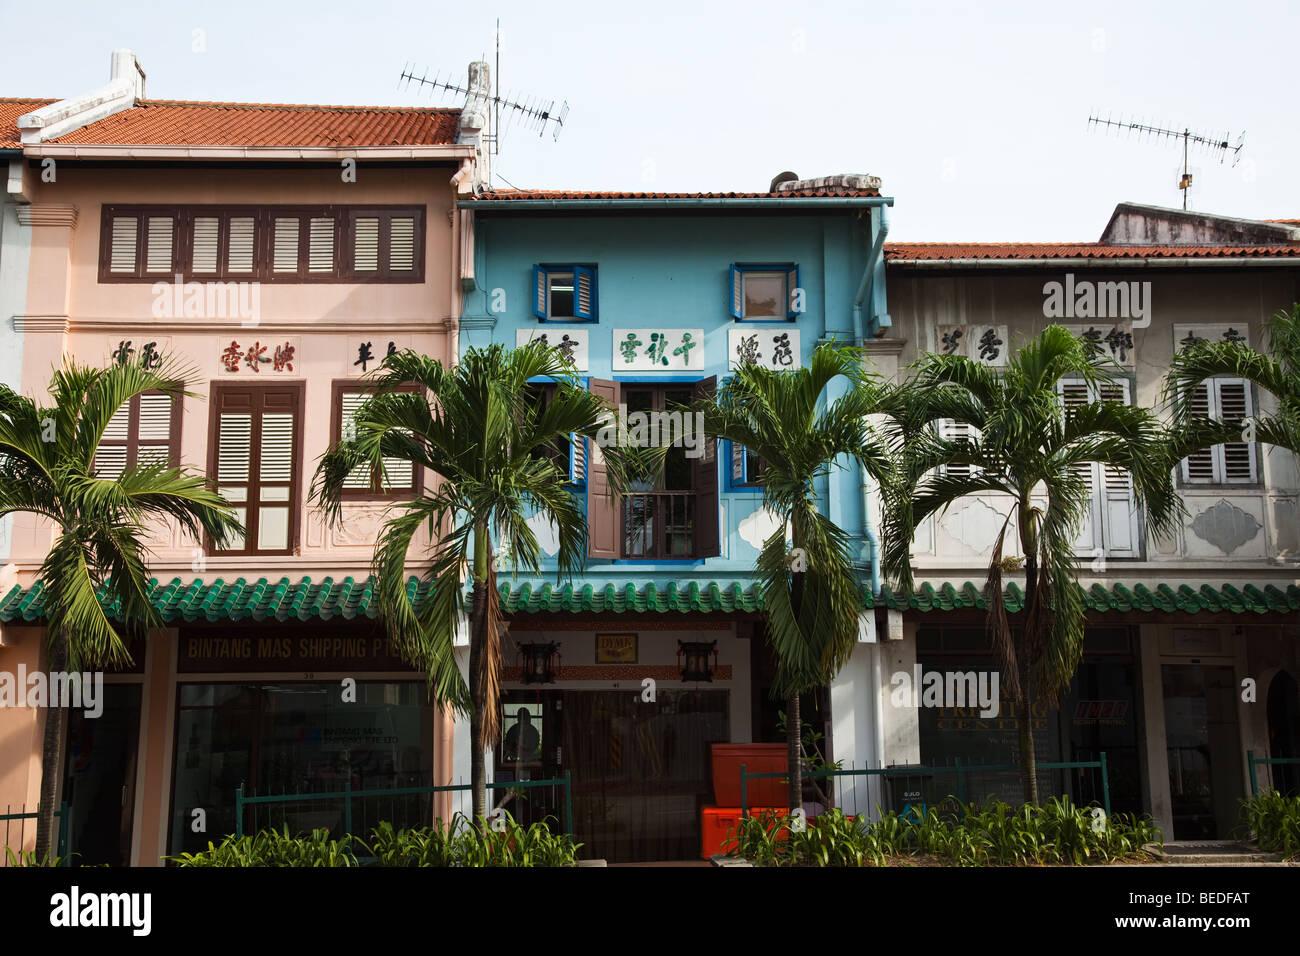 Colourful Singapore Shophouses - Stock Image